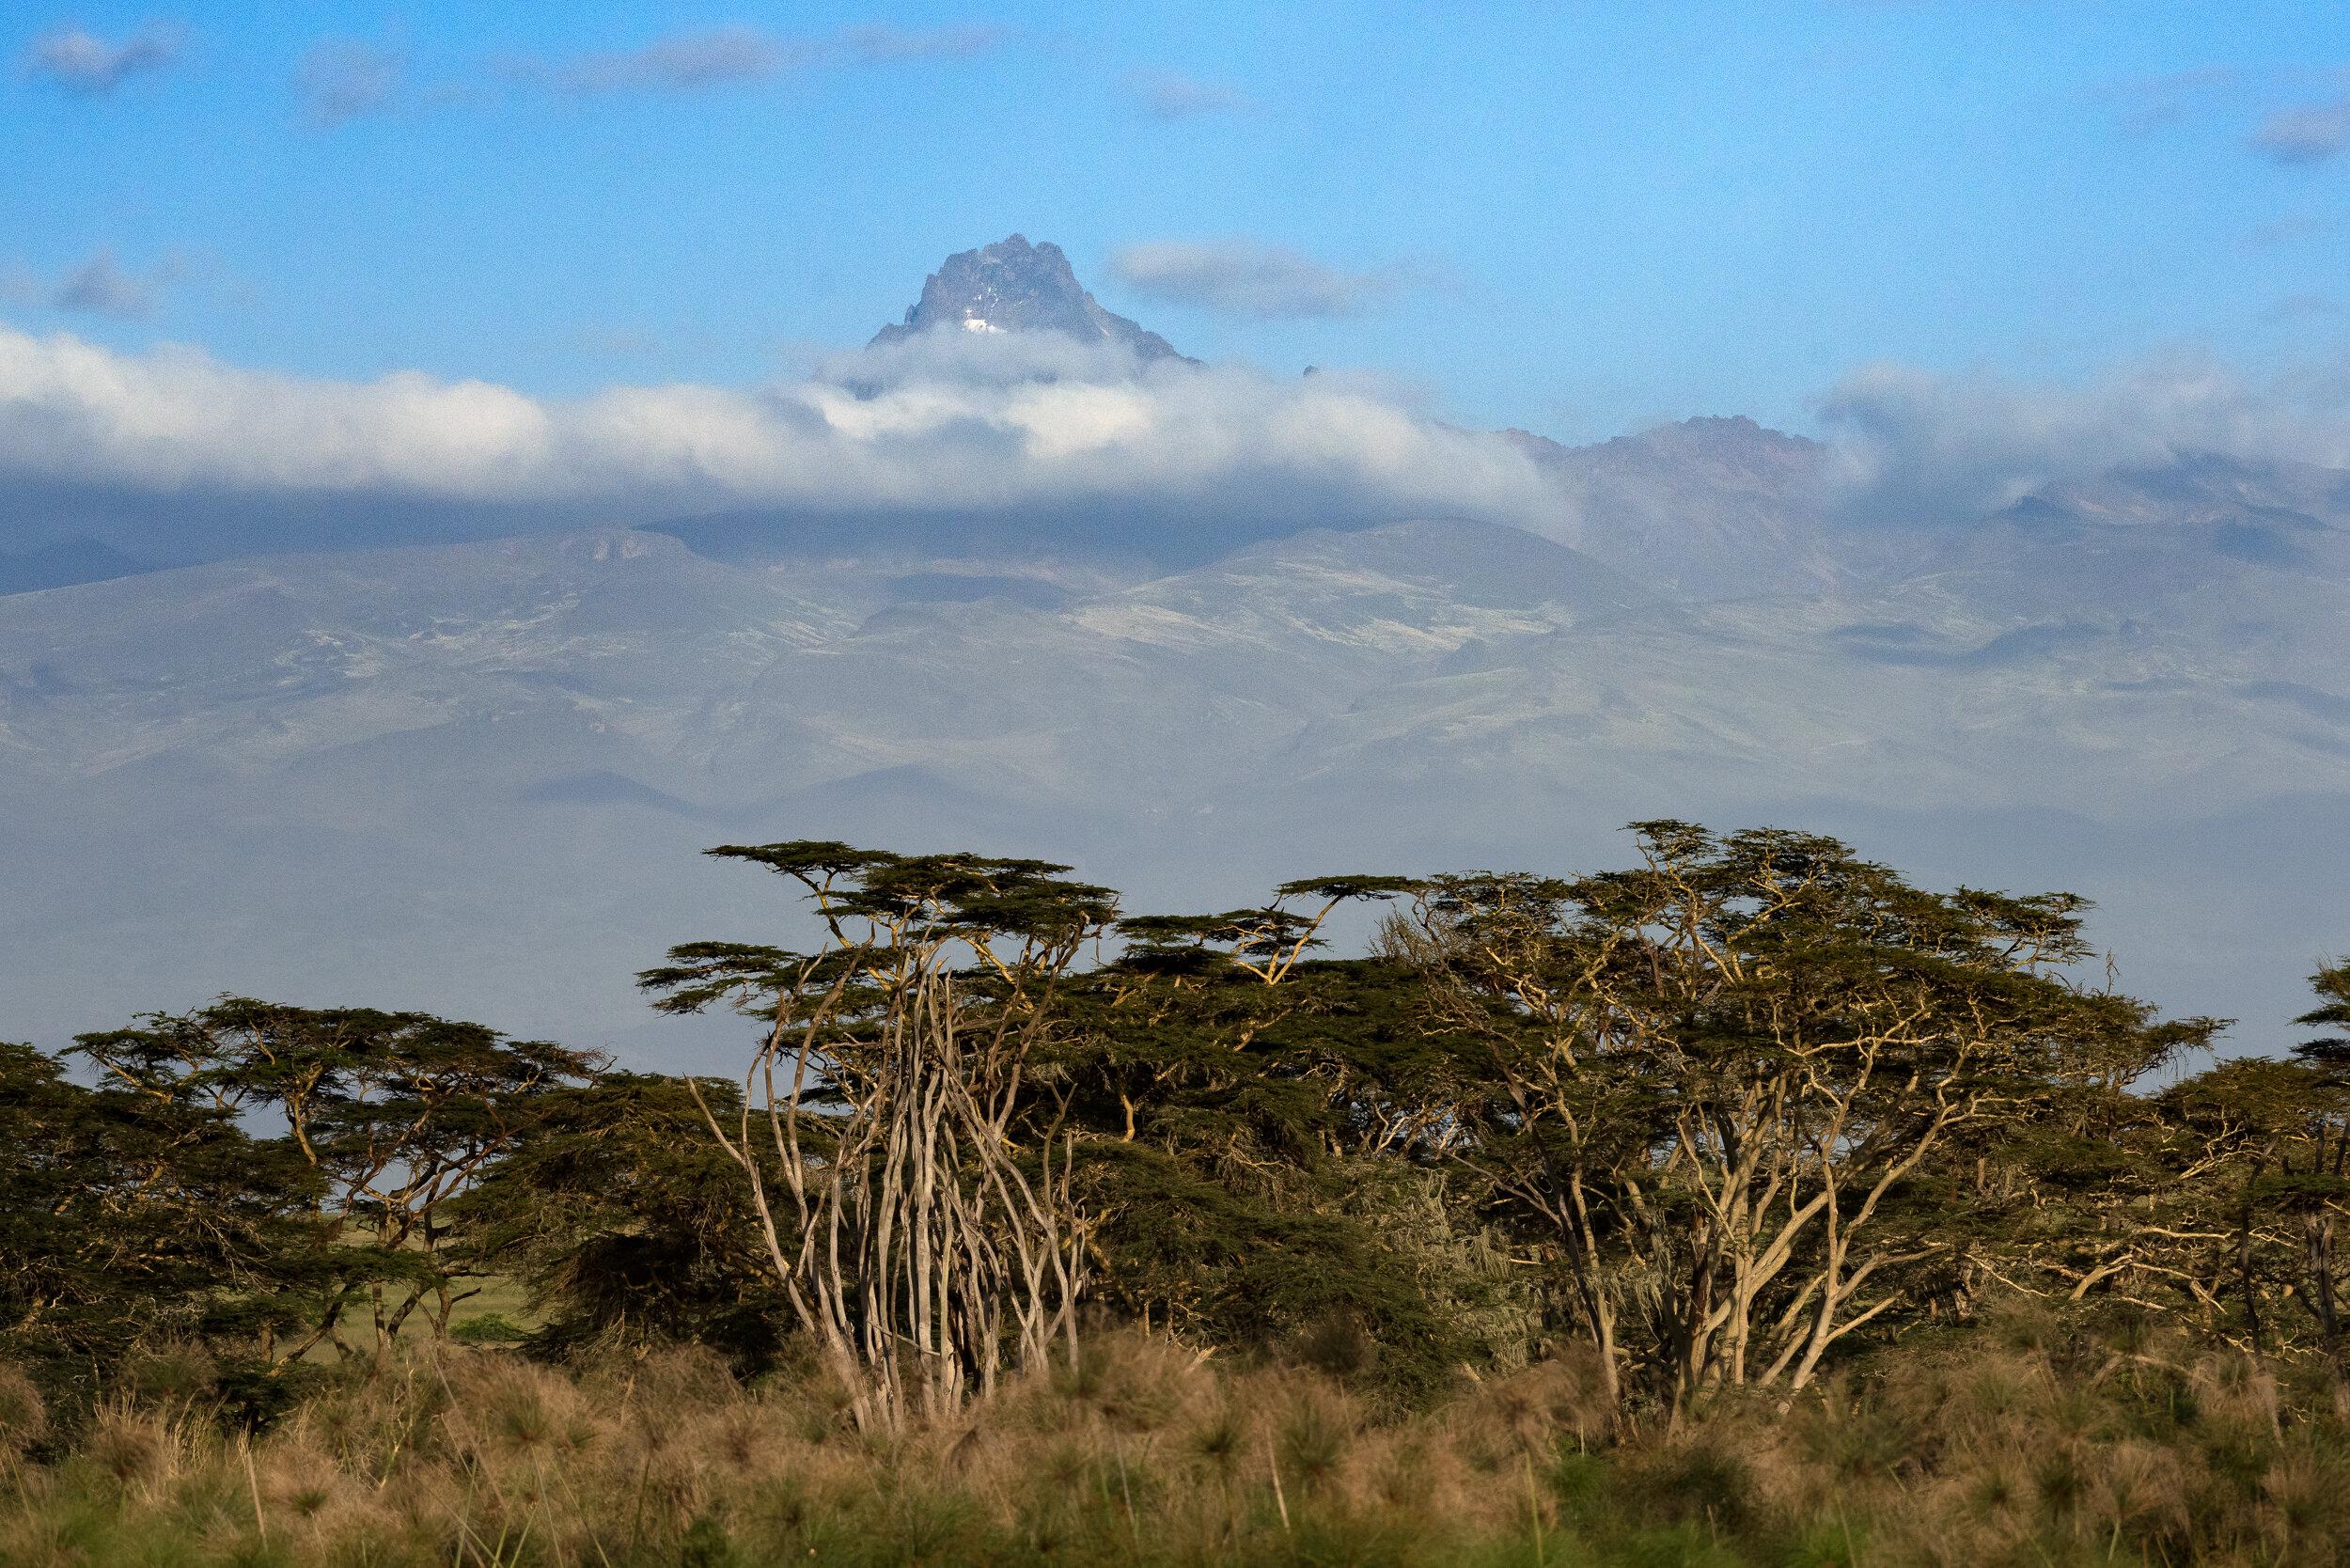 Kenya-9715.jpg